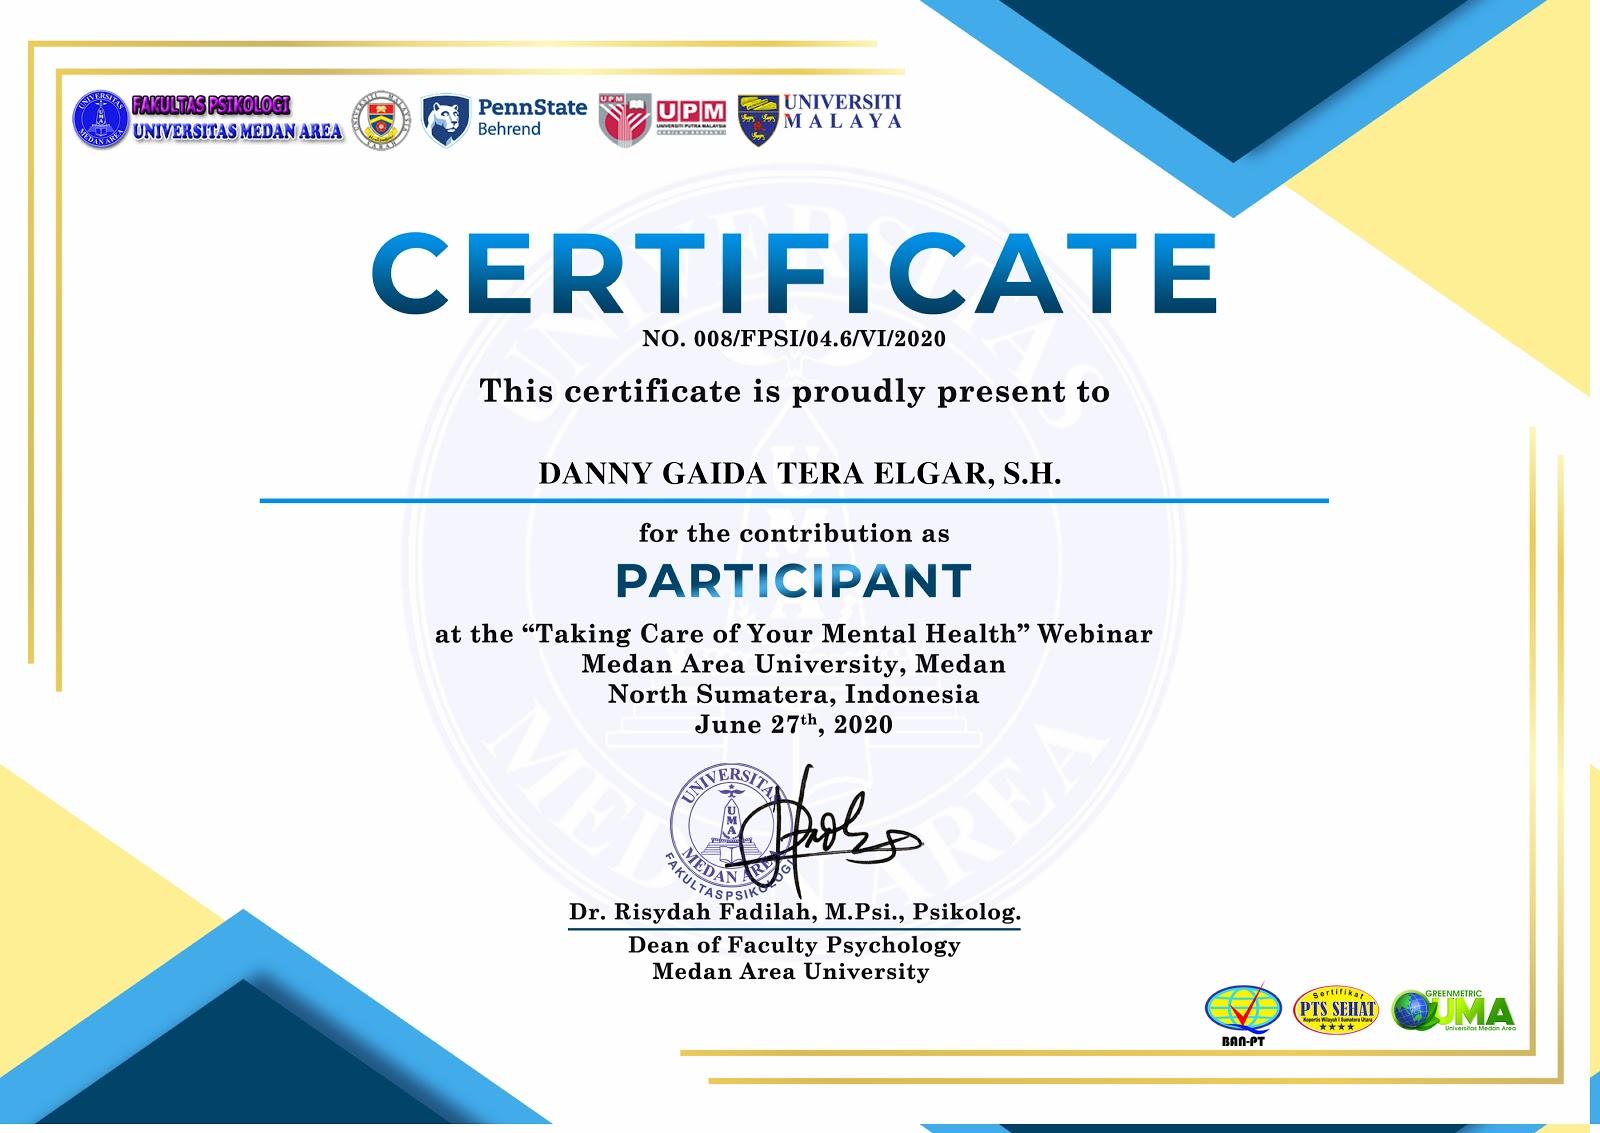 Sertifikat Fakultas Psikologi Universitas Medan Area (UMA) | Sabtu, 27 Juni 2020